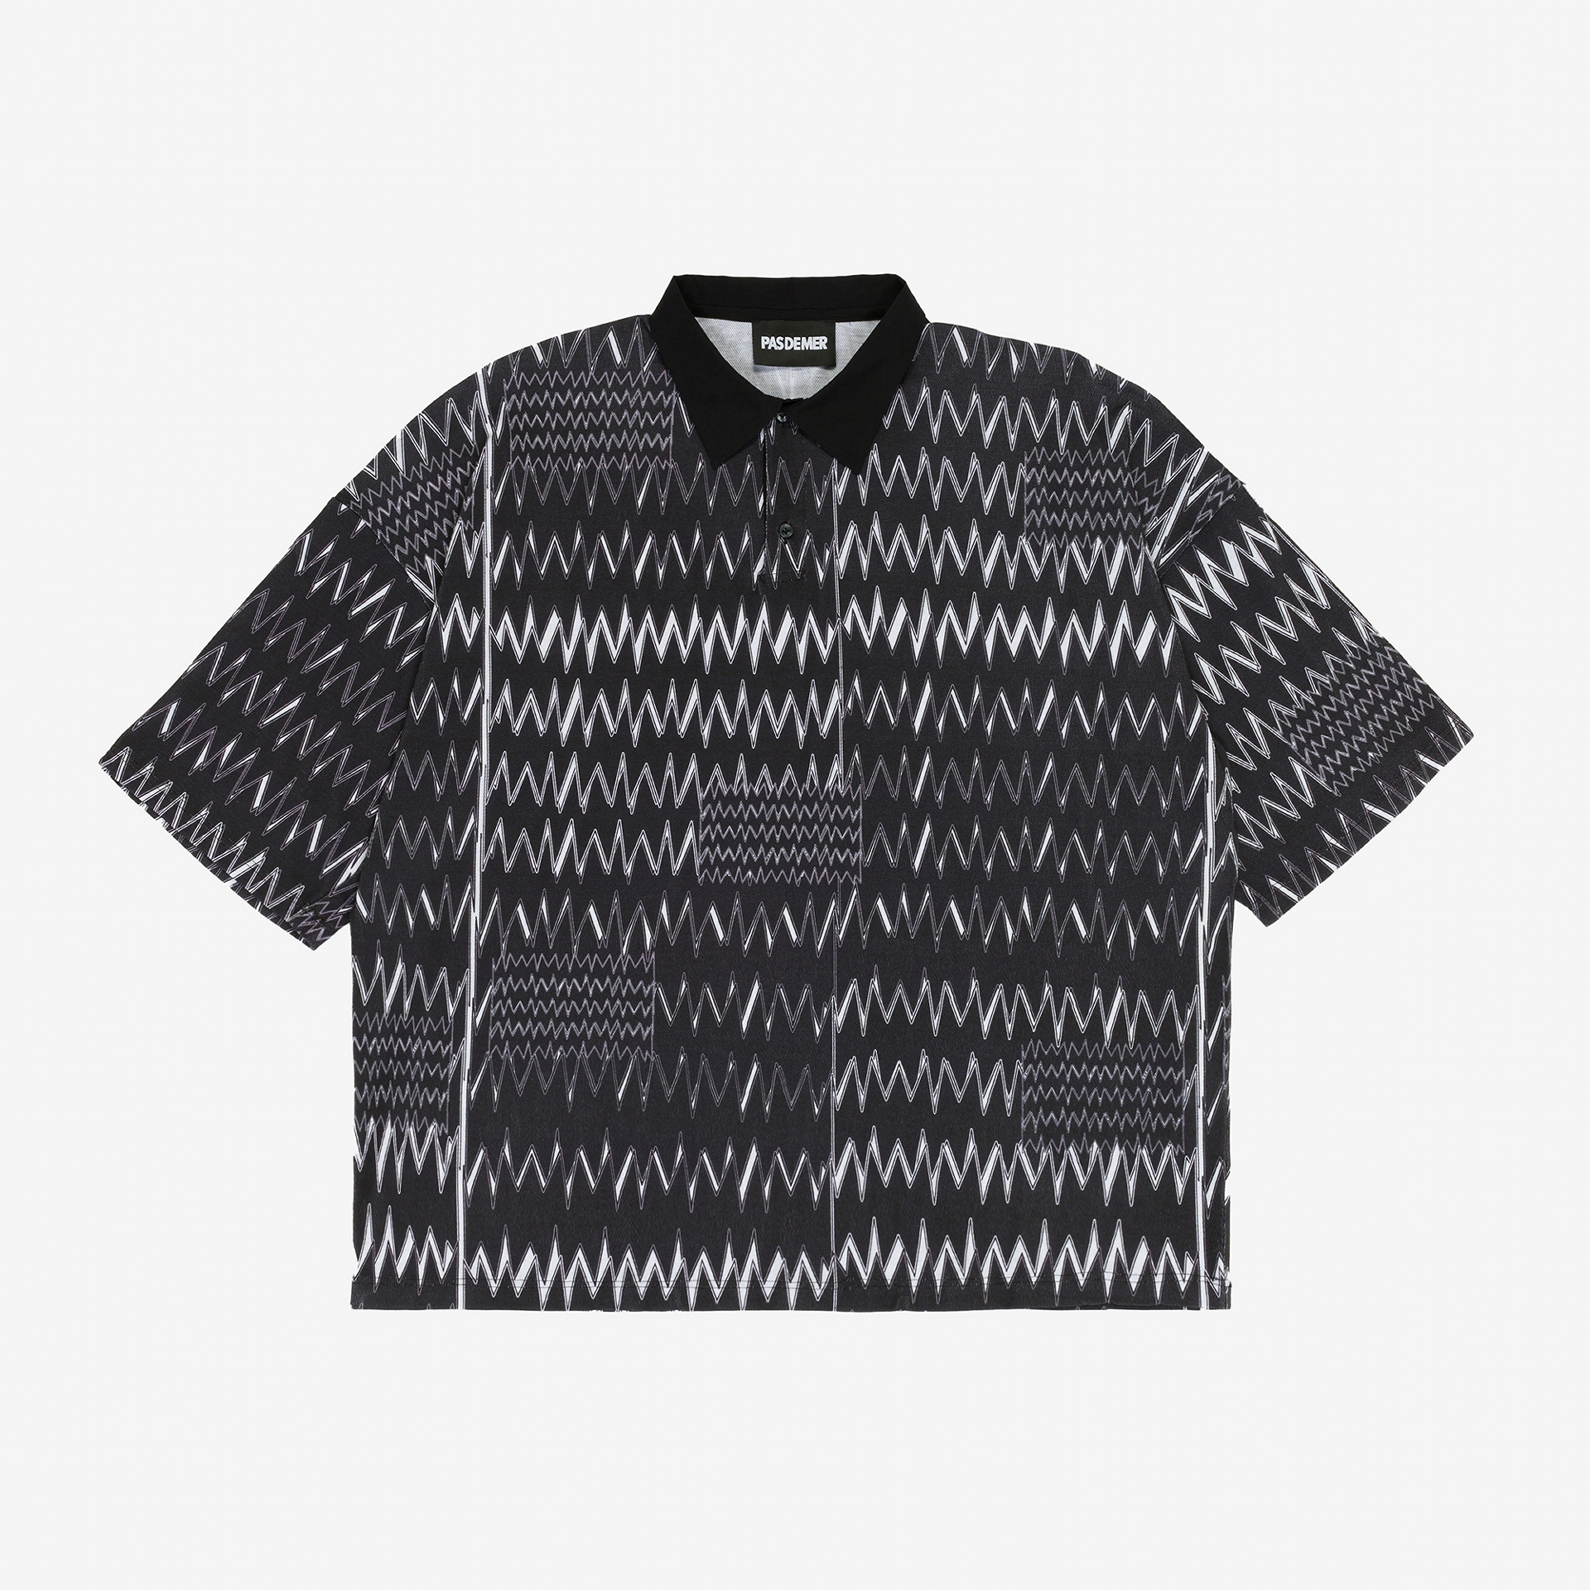 【PAS DE MER/パドゥメ】SCOSSA POLO オーバーサイズポロシャツ / BLACK